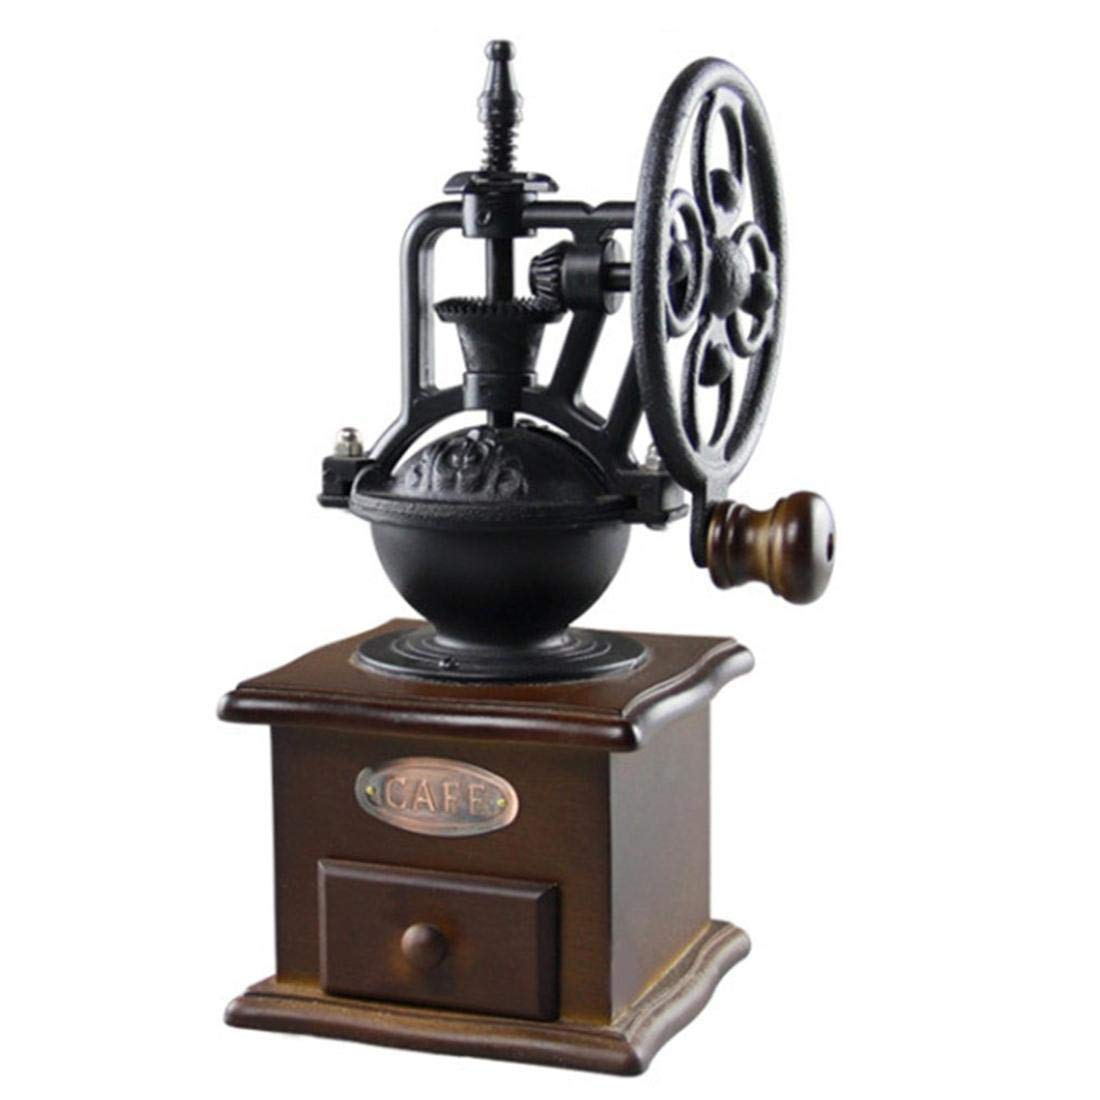 Manual coffee grinder, vintage style, wooden, coffee bean mill grinding ferris wheel, wheel design, manual coffee machine with wooden drawers, Black